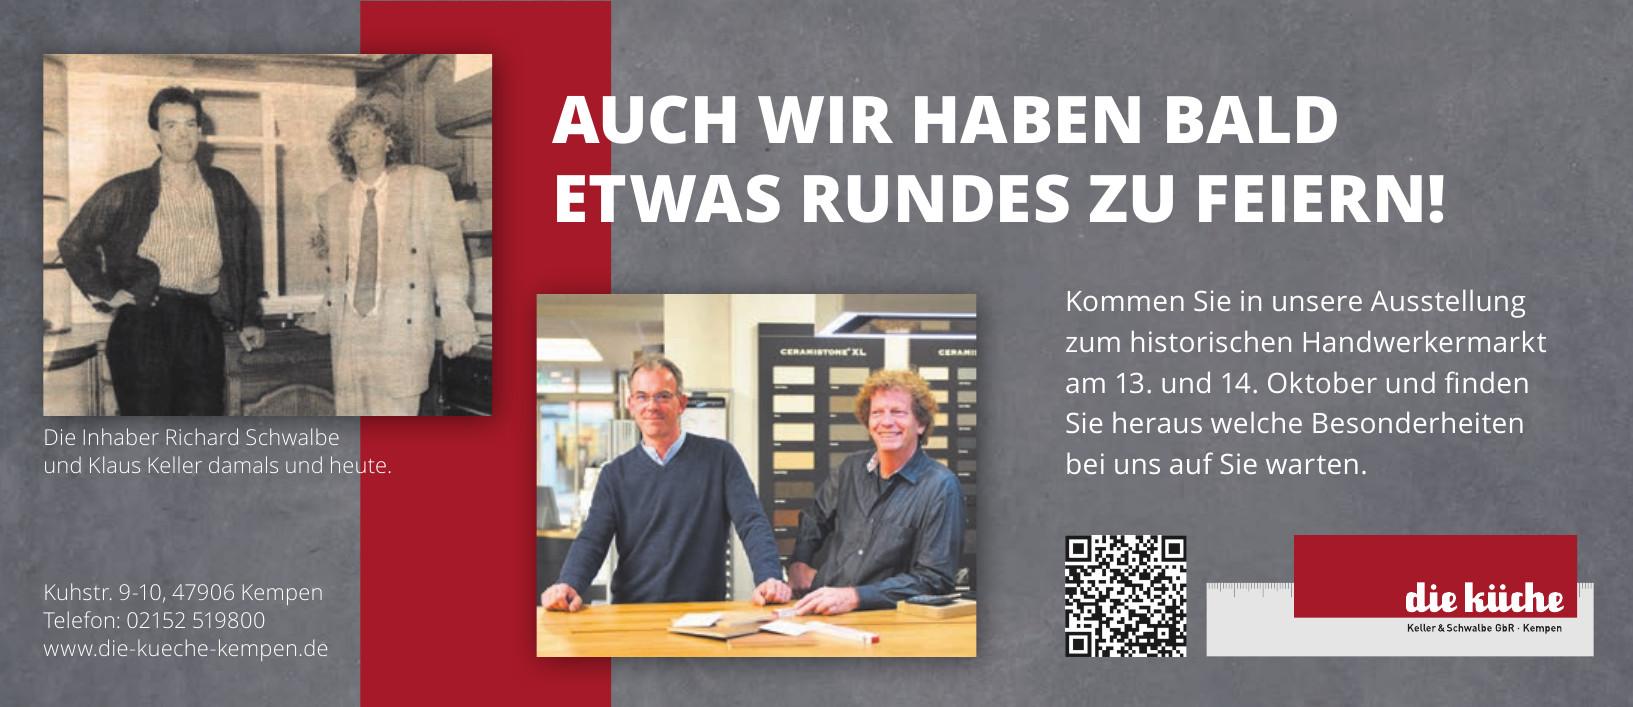 Die Küche Keller & Schwalbe GbR